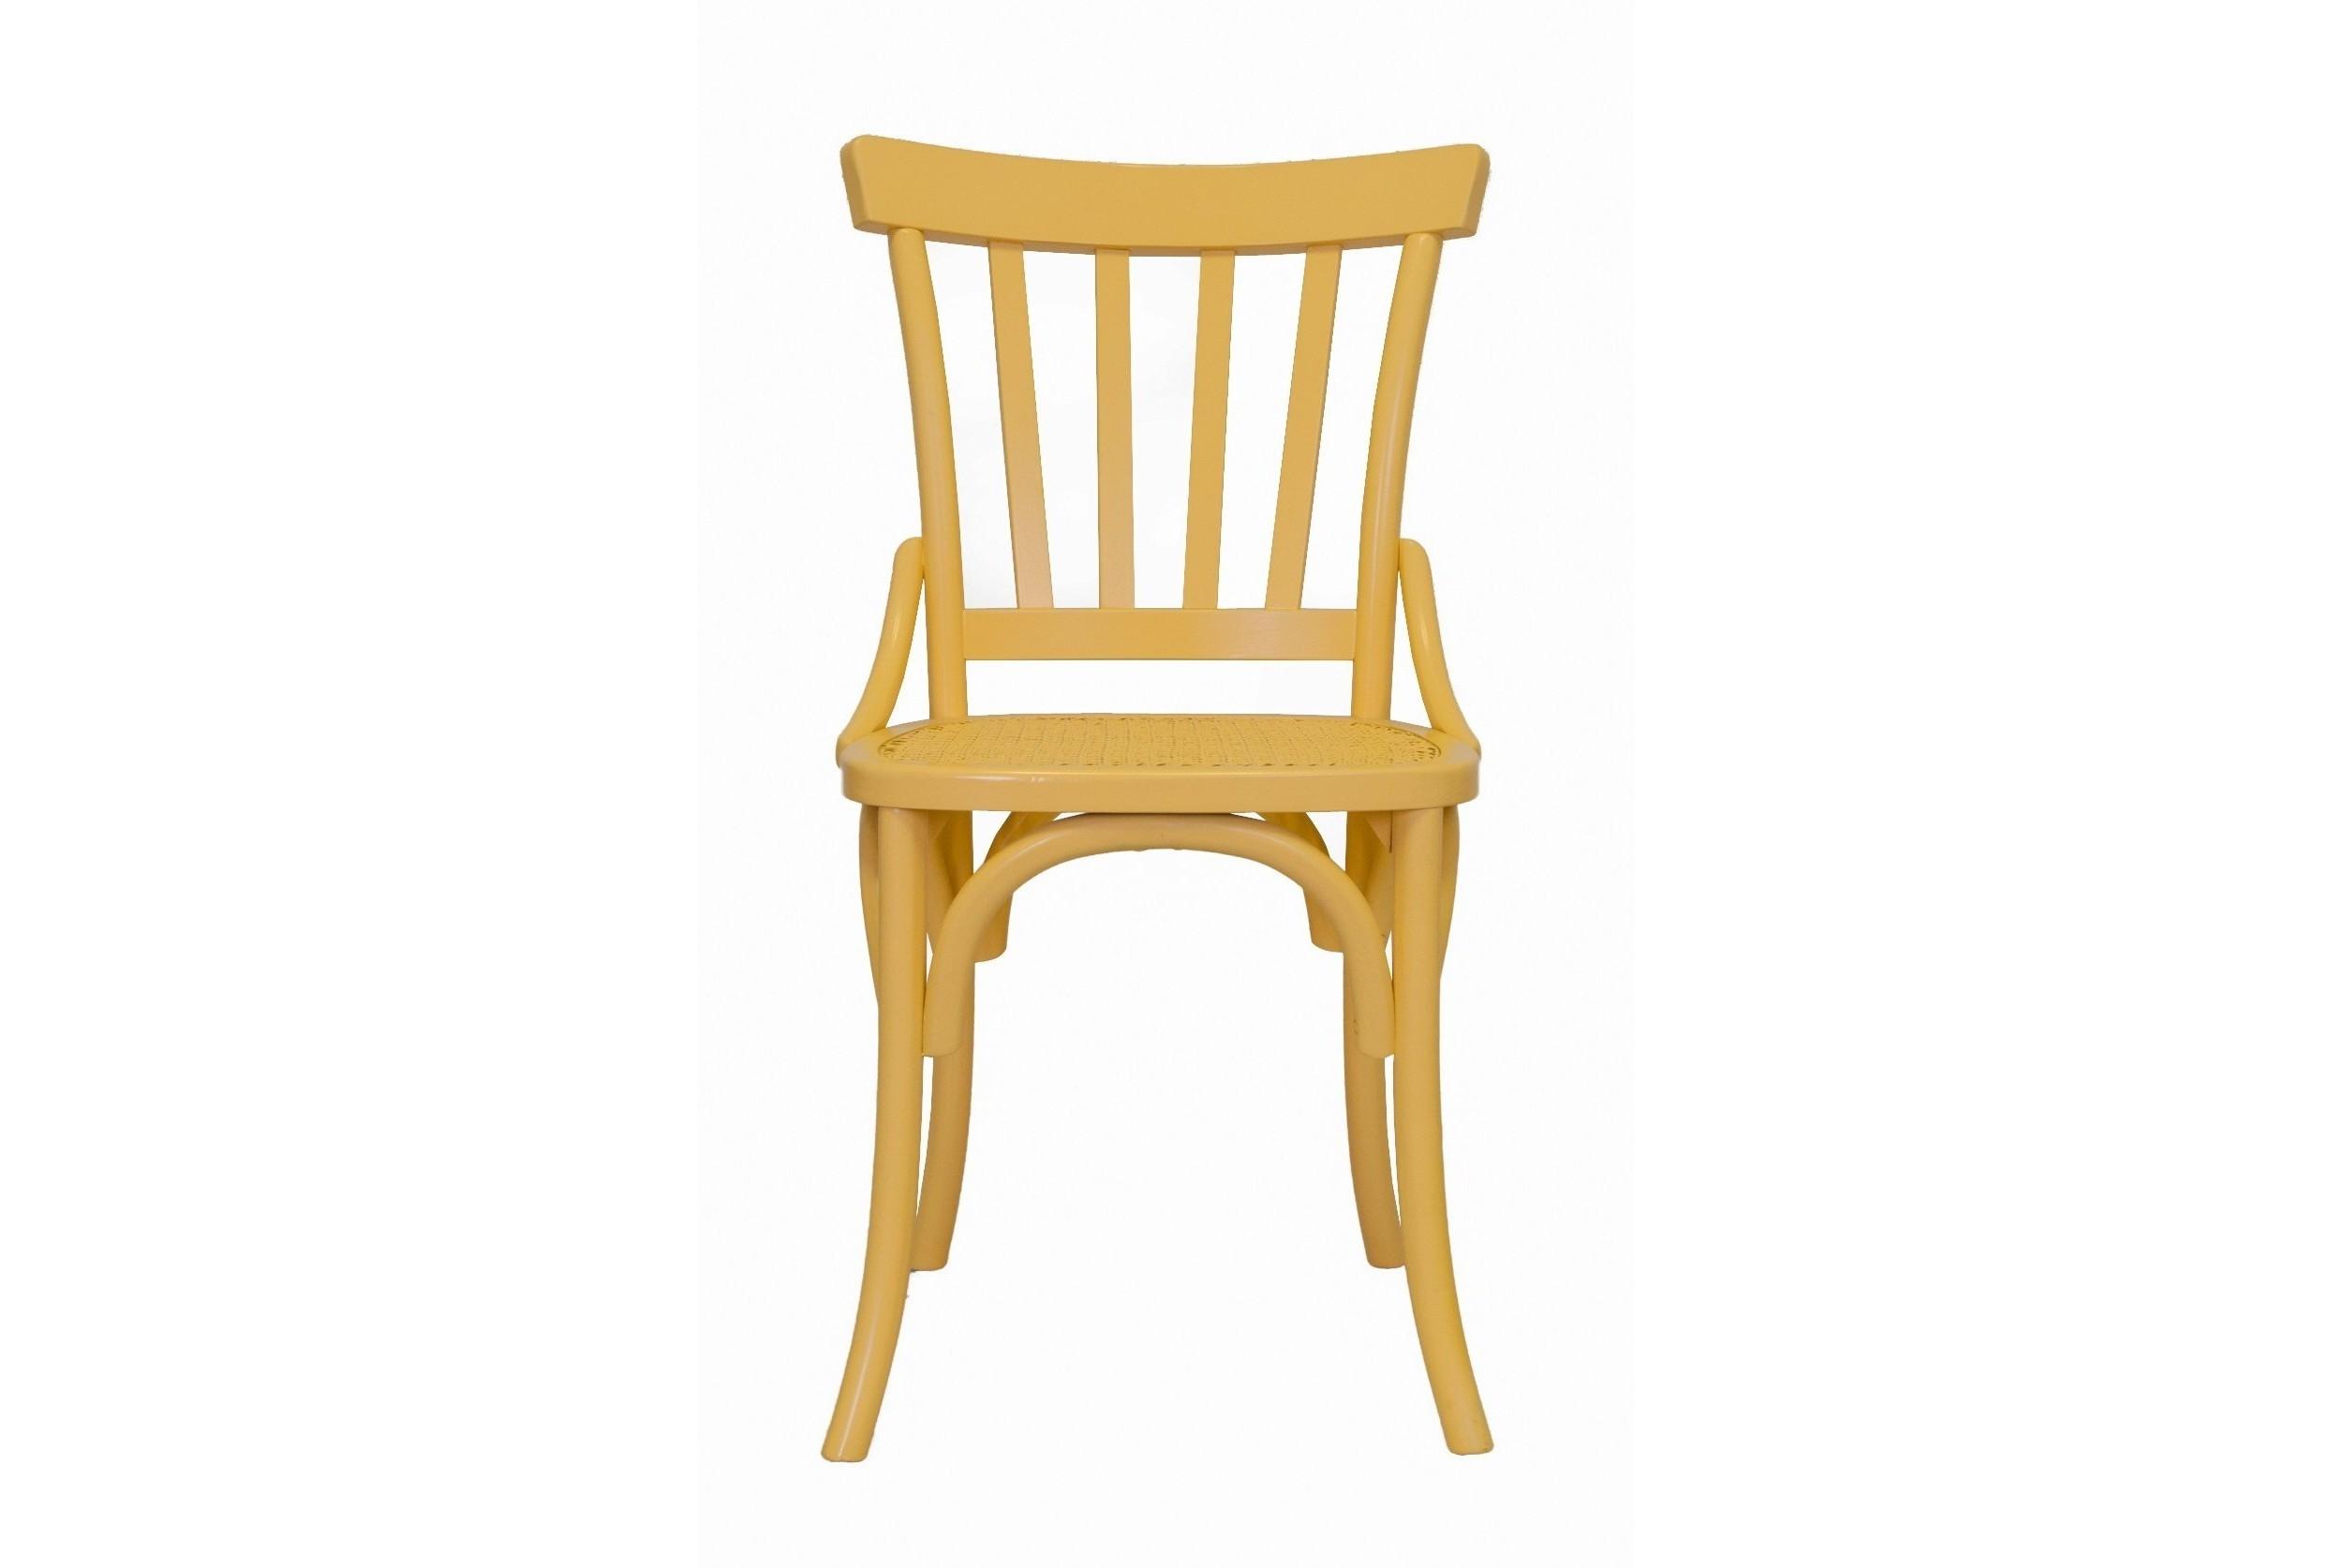 Кухонный стул Colibri 14362262 от thefurnish